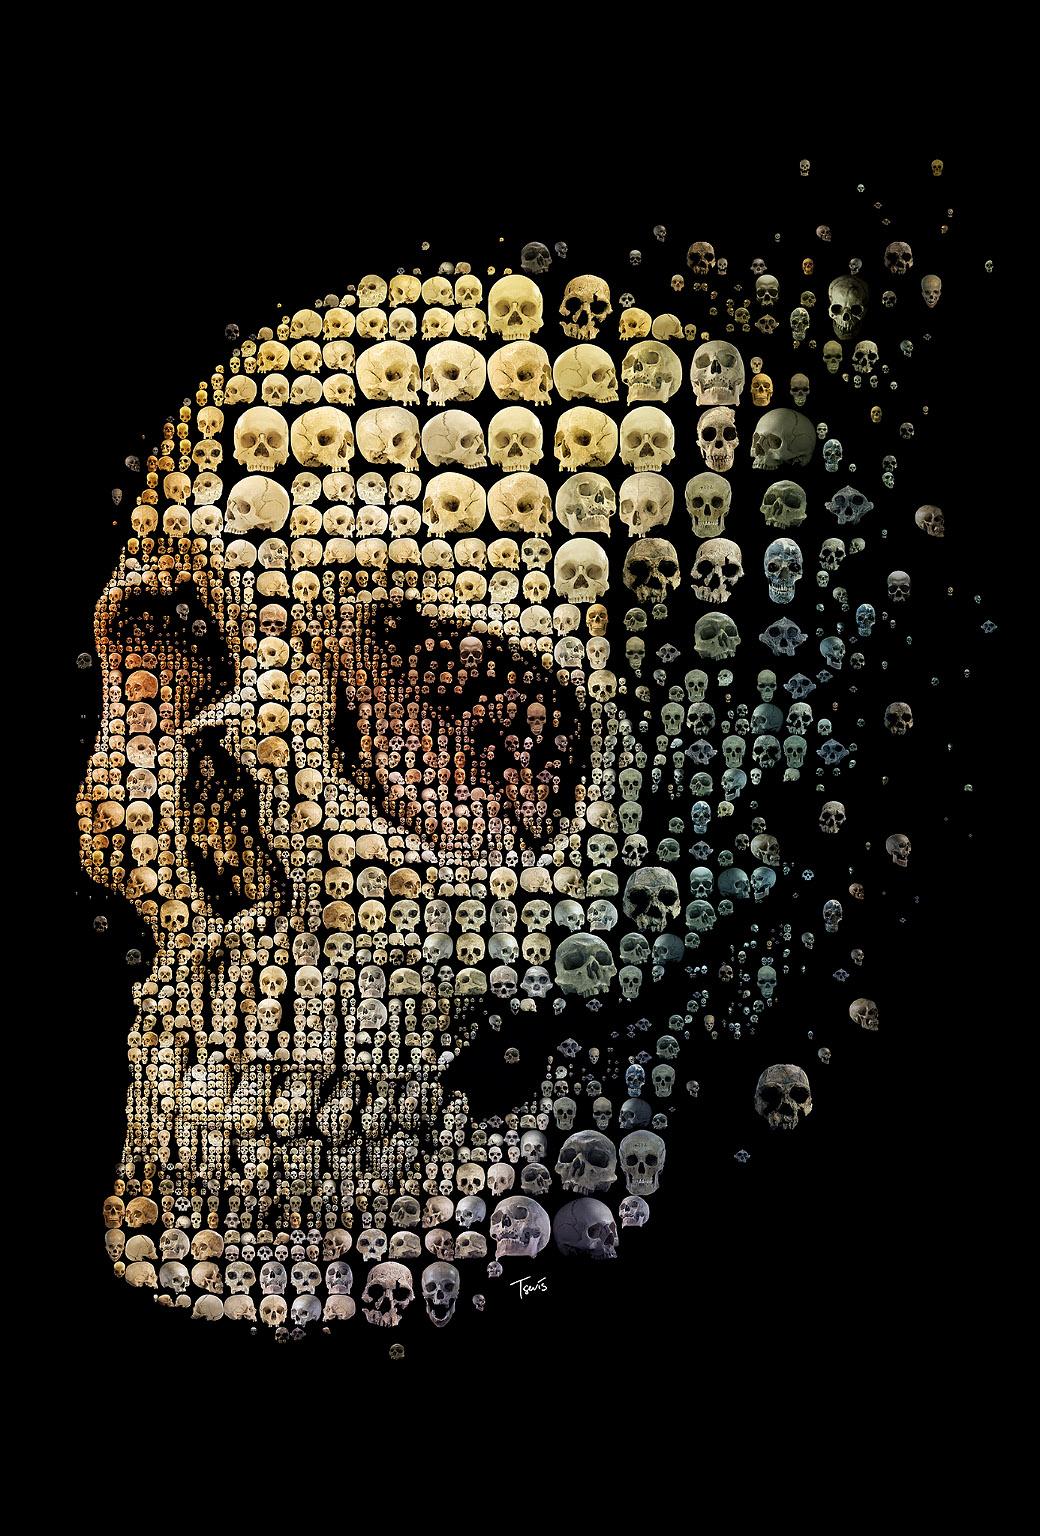 Skull Iphone Wallpaper Apple Watch Wallpaper Skull 1040x1536 Download Hd Wallpaper Wallpapertip